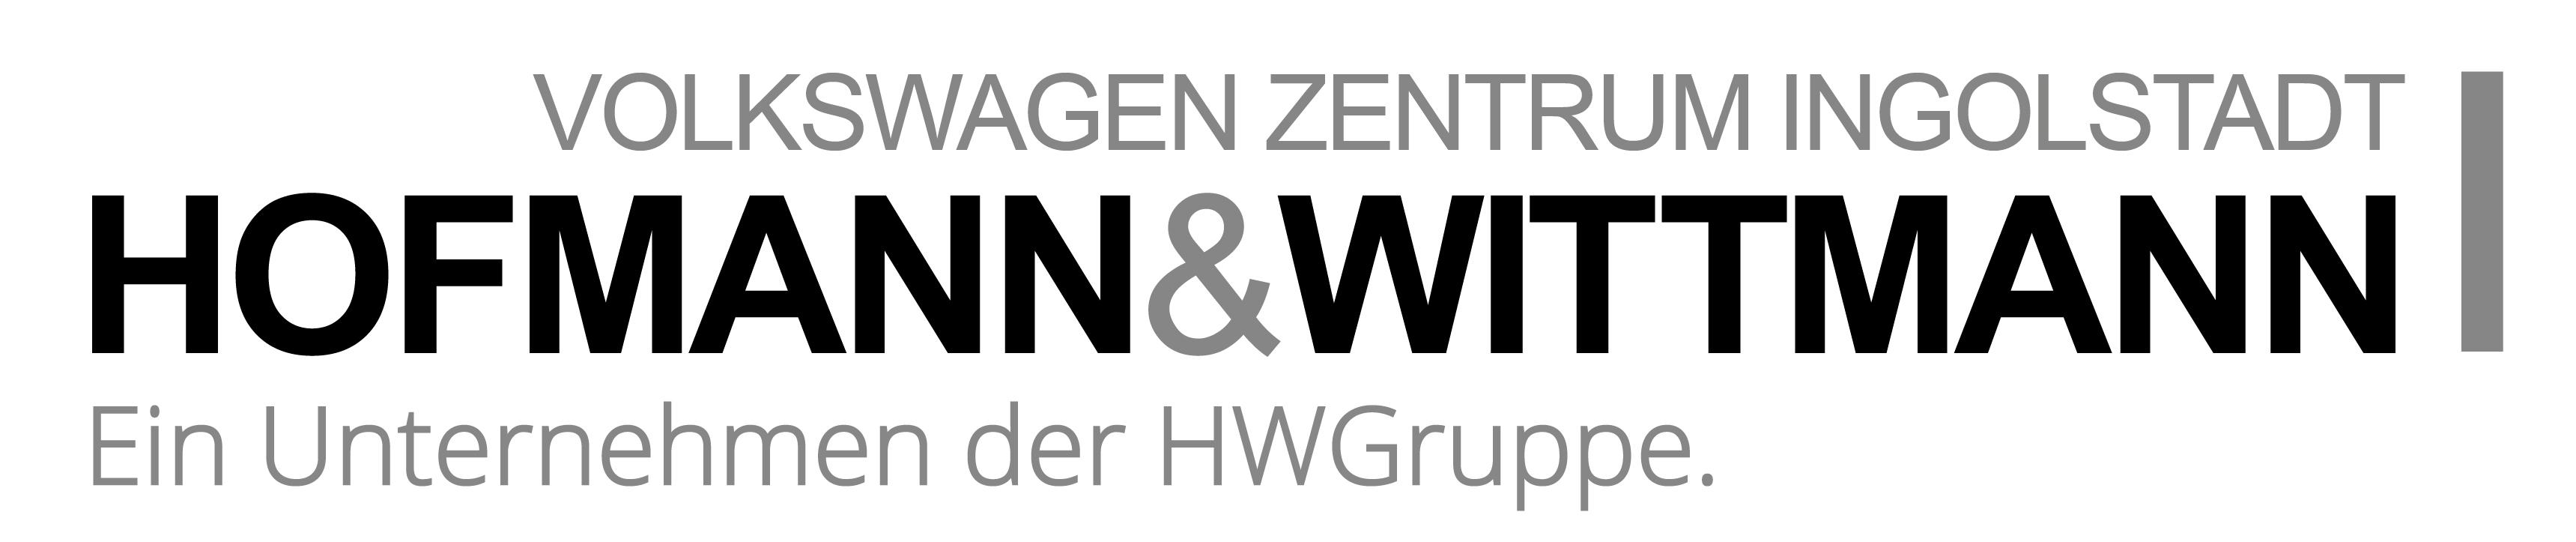 Autohaus Hofmann & Wittmann GmbH - Volkswagen Zentrum Ingolstadt